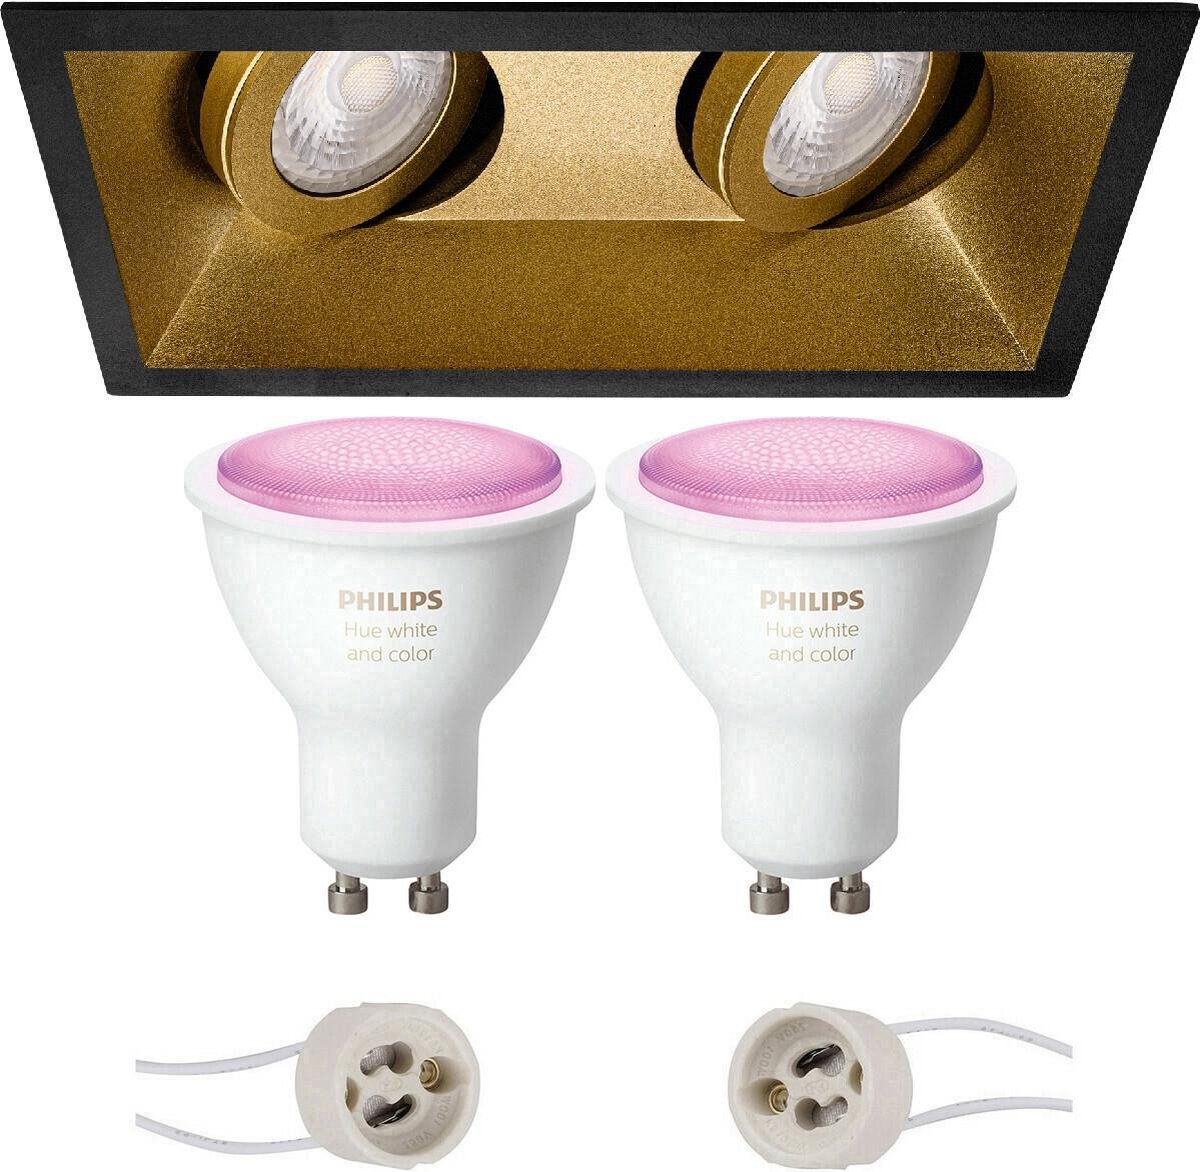 PHILIPS HUE - LED Spot Set GU10 - White and Color Ambiance - Bluetooth - Proma Zano Pro - Inbouw Rechthoek Dubbel - Mat Zwart/Goud - Kantelbaar - 185x93mm